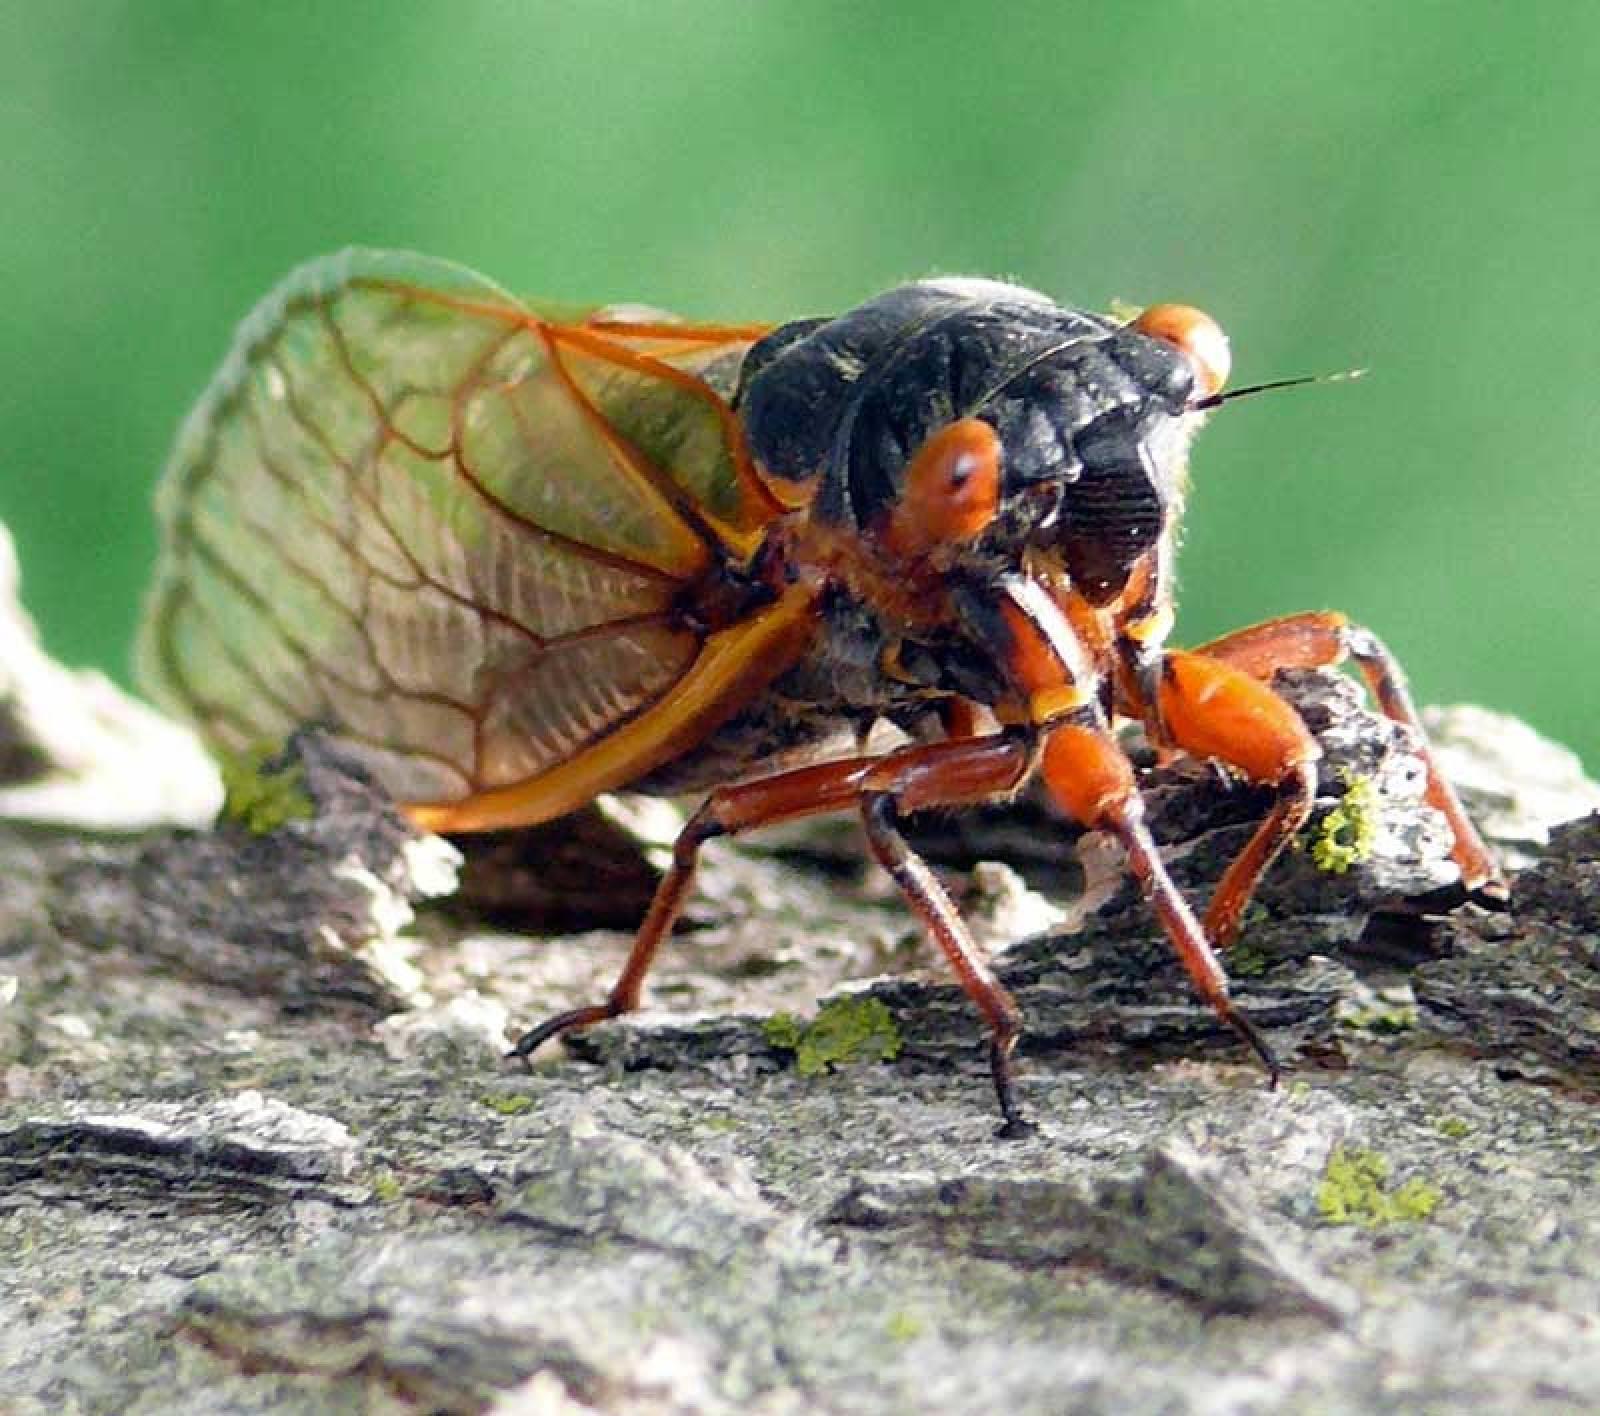 17 Year Cicada Photos